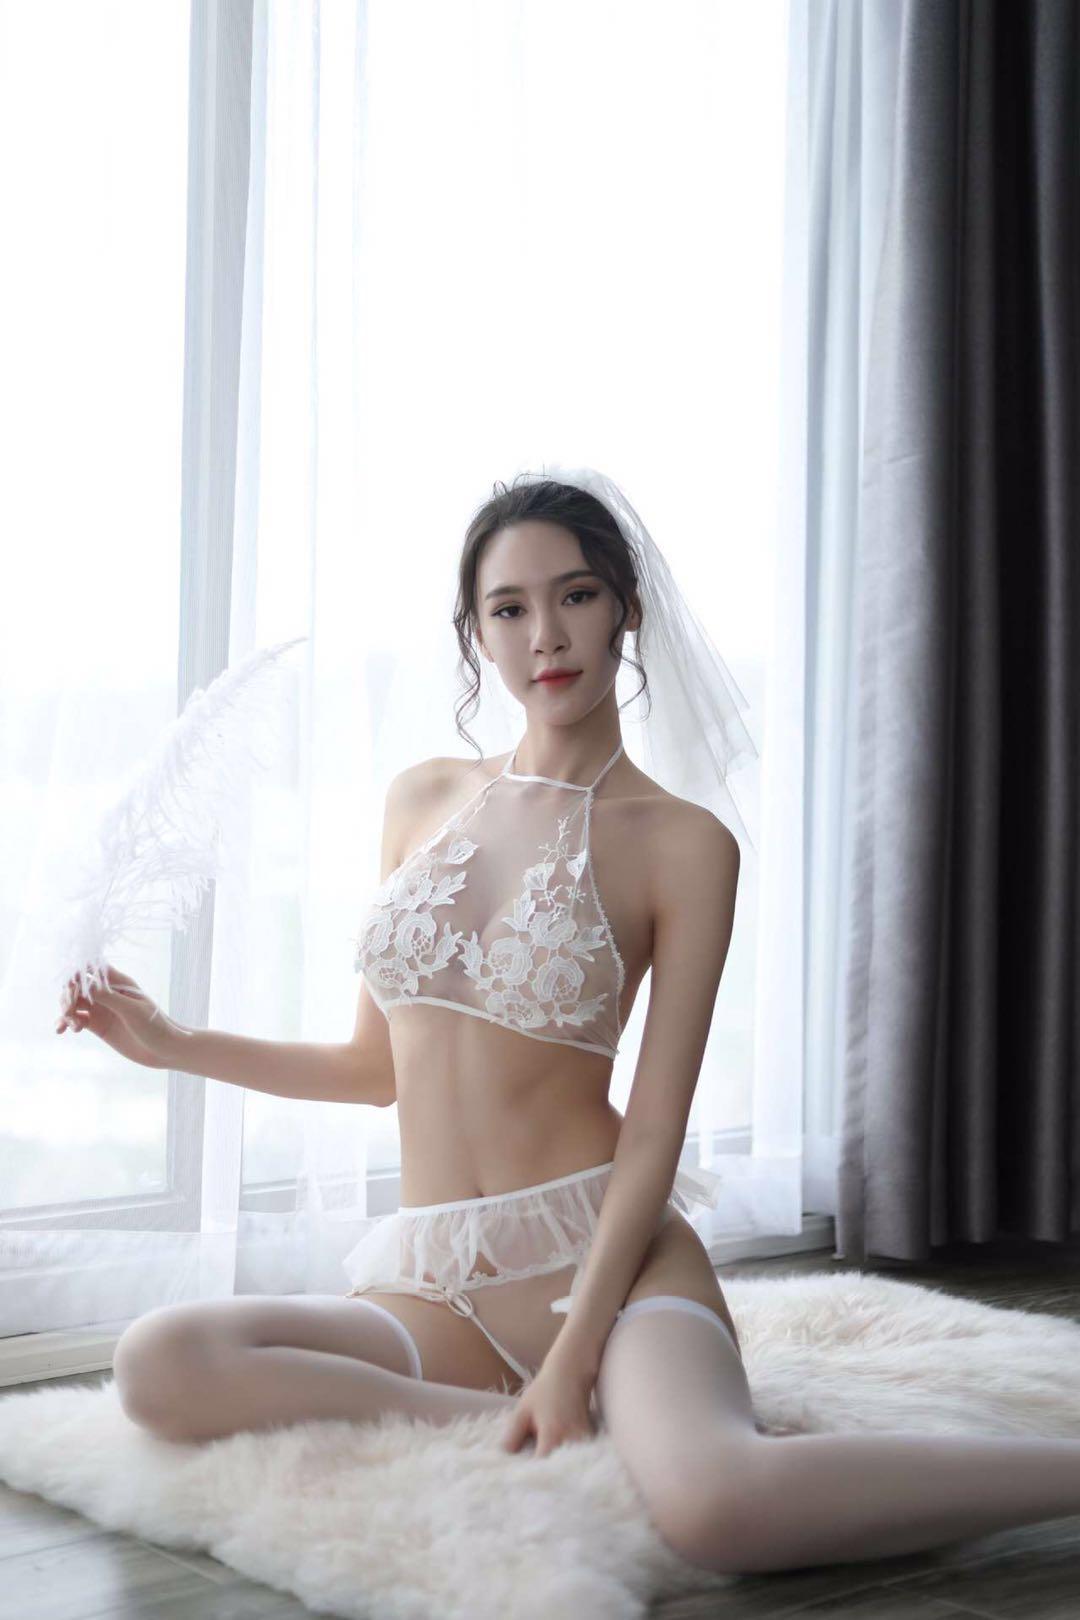 Sheer n Sexy : Dreamy Angels Bridal Garter Set Lingerie